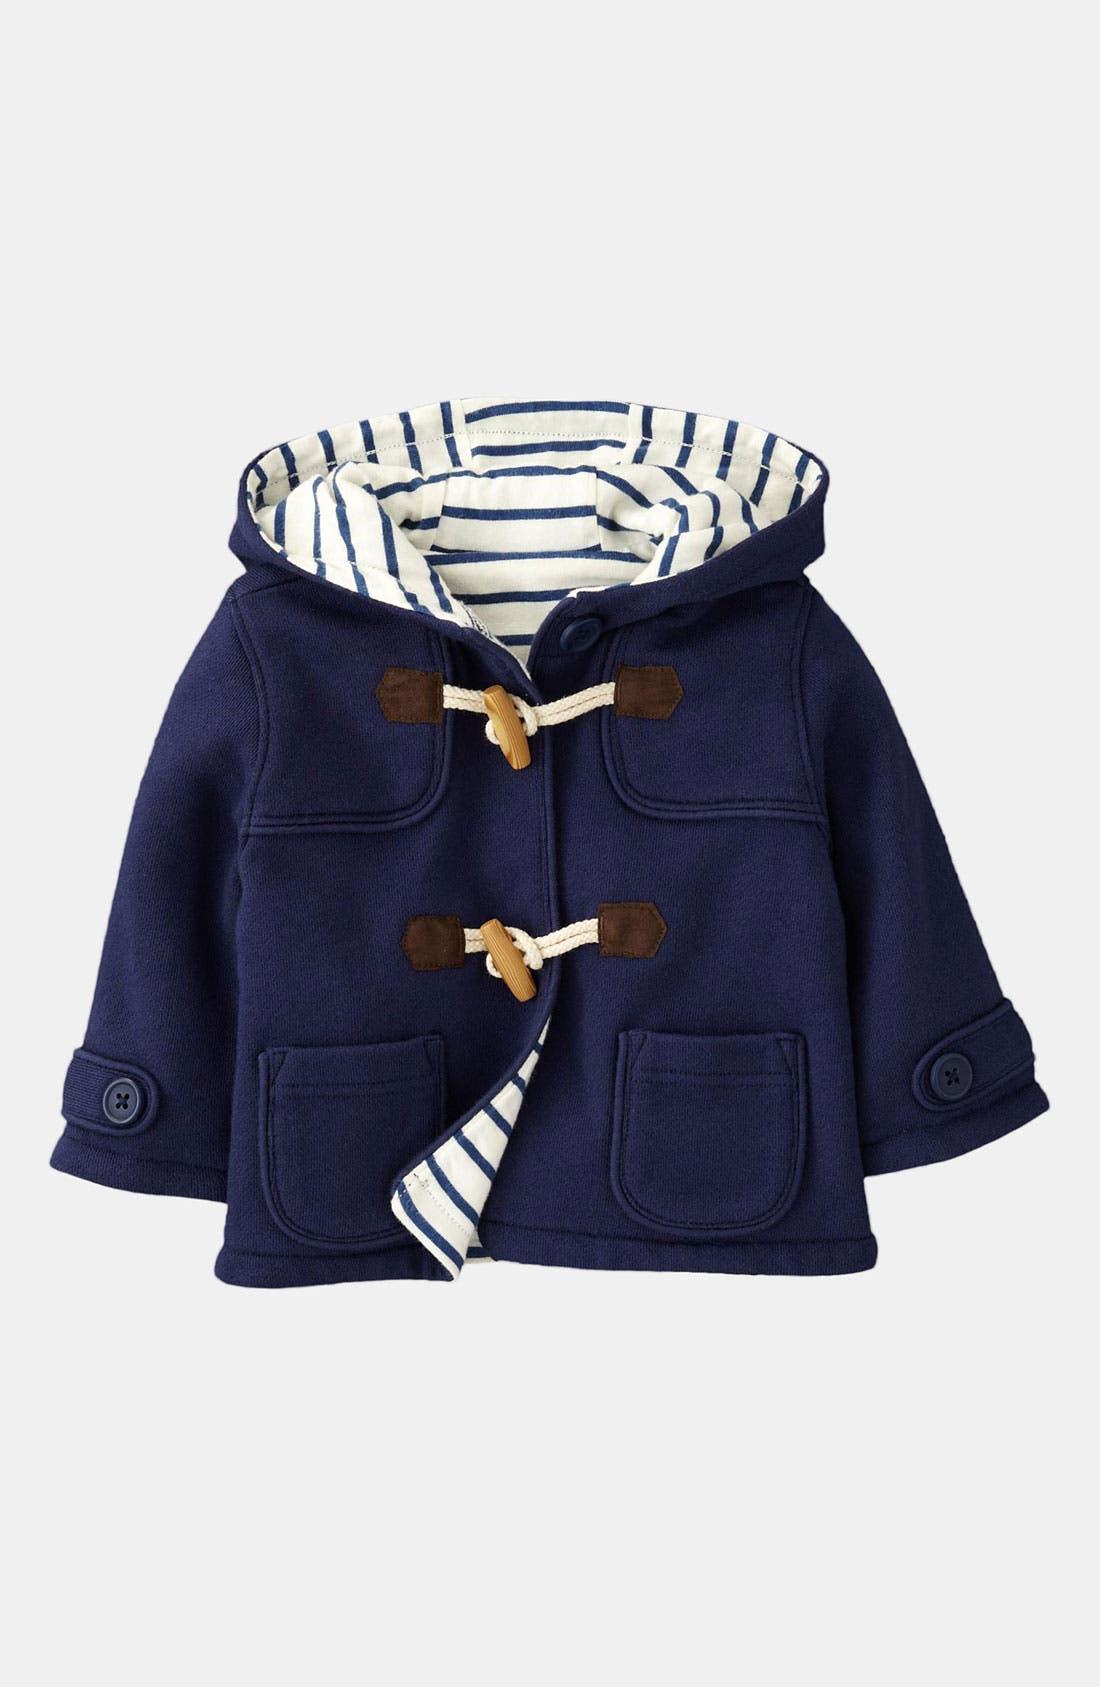 Main Image - Mini Boden Duffle Coat (Infant)